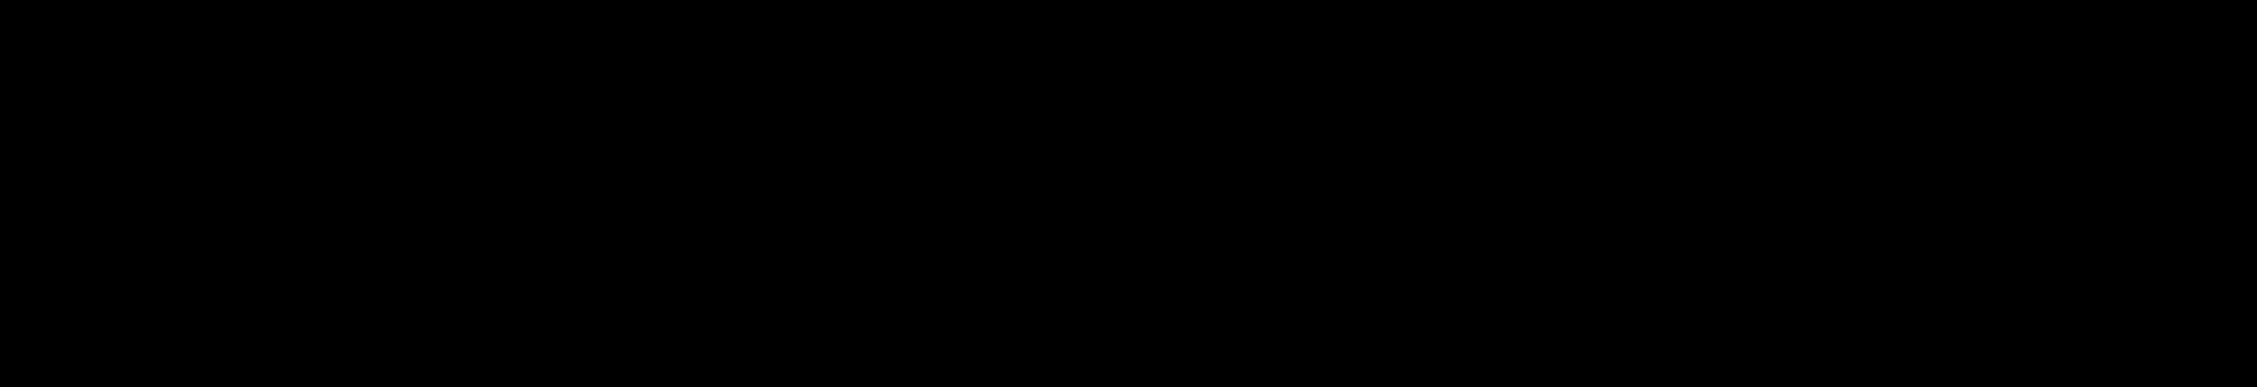 Image result for wincehester logo png